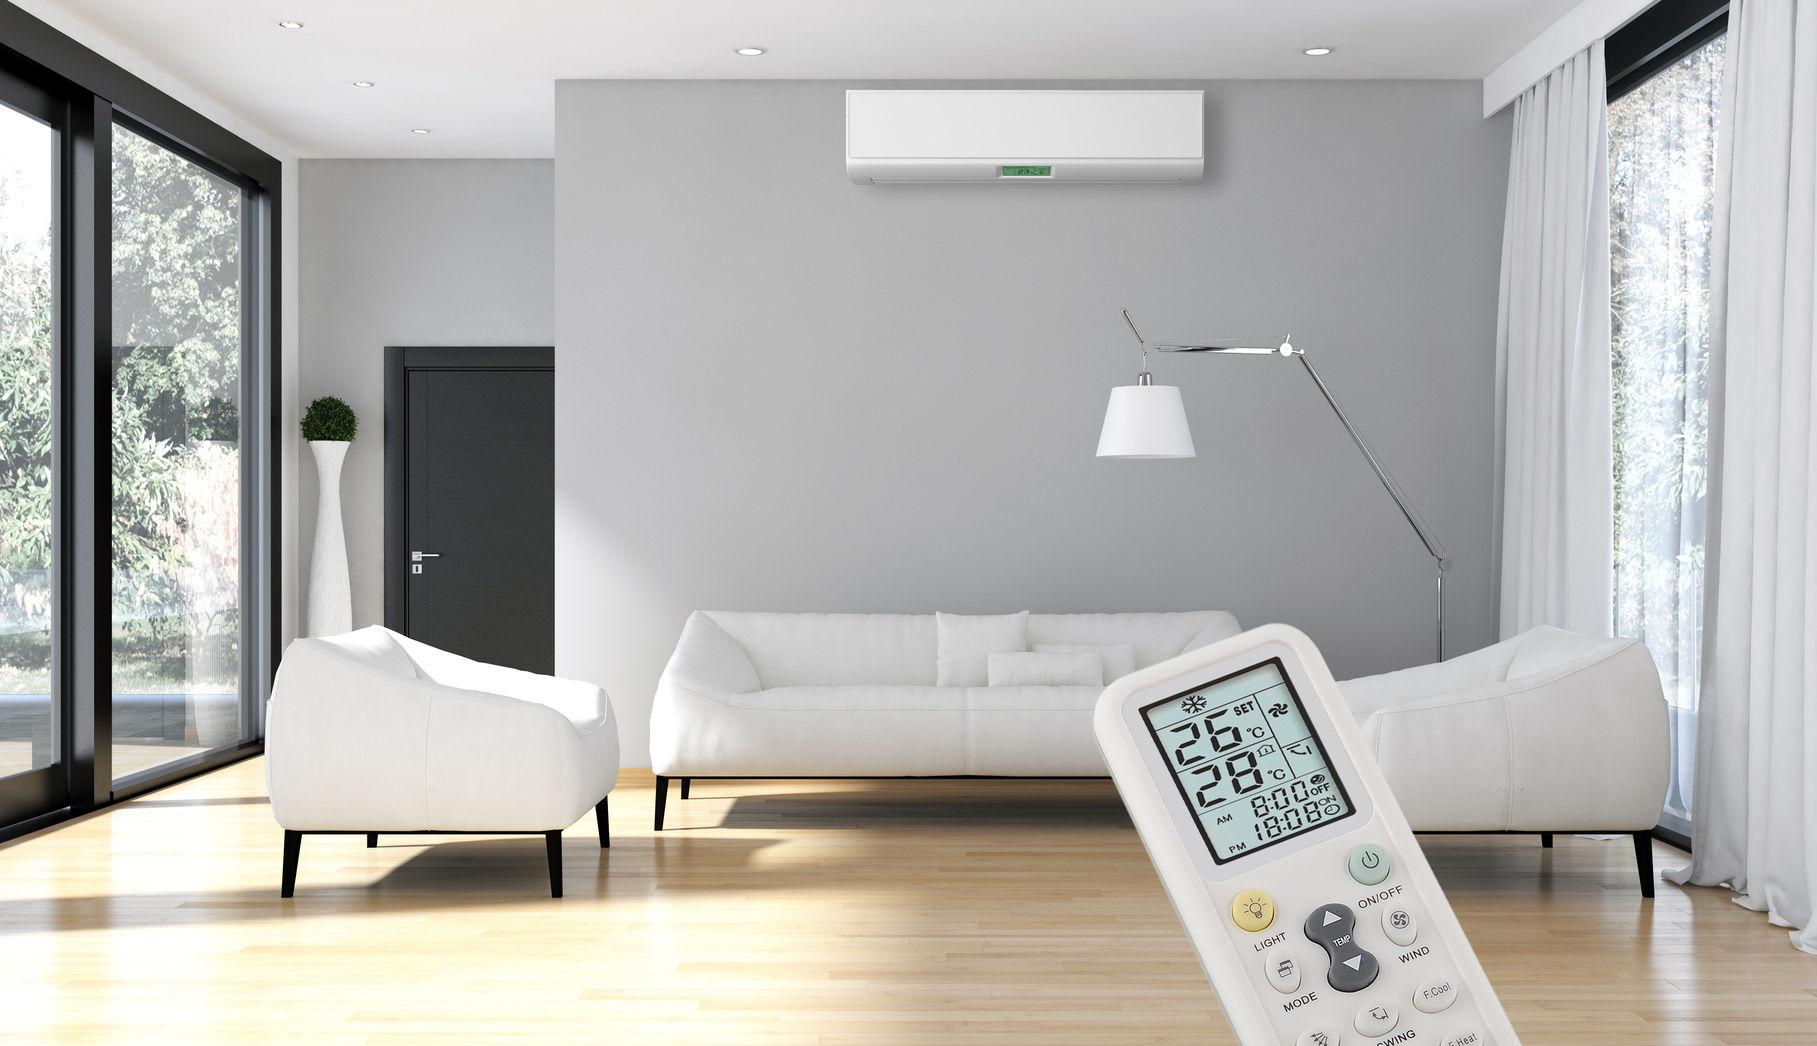 Image 3 bandeau climatisation